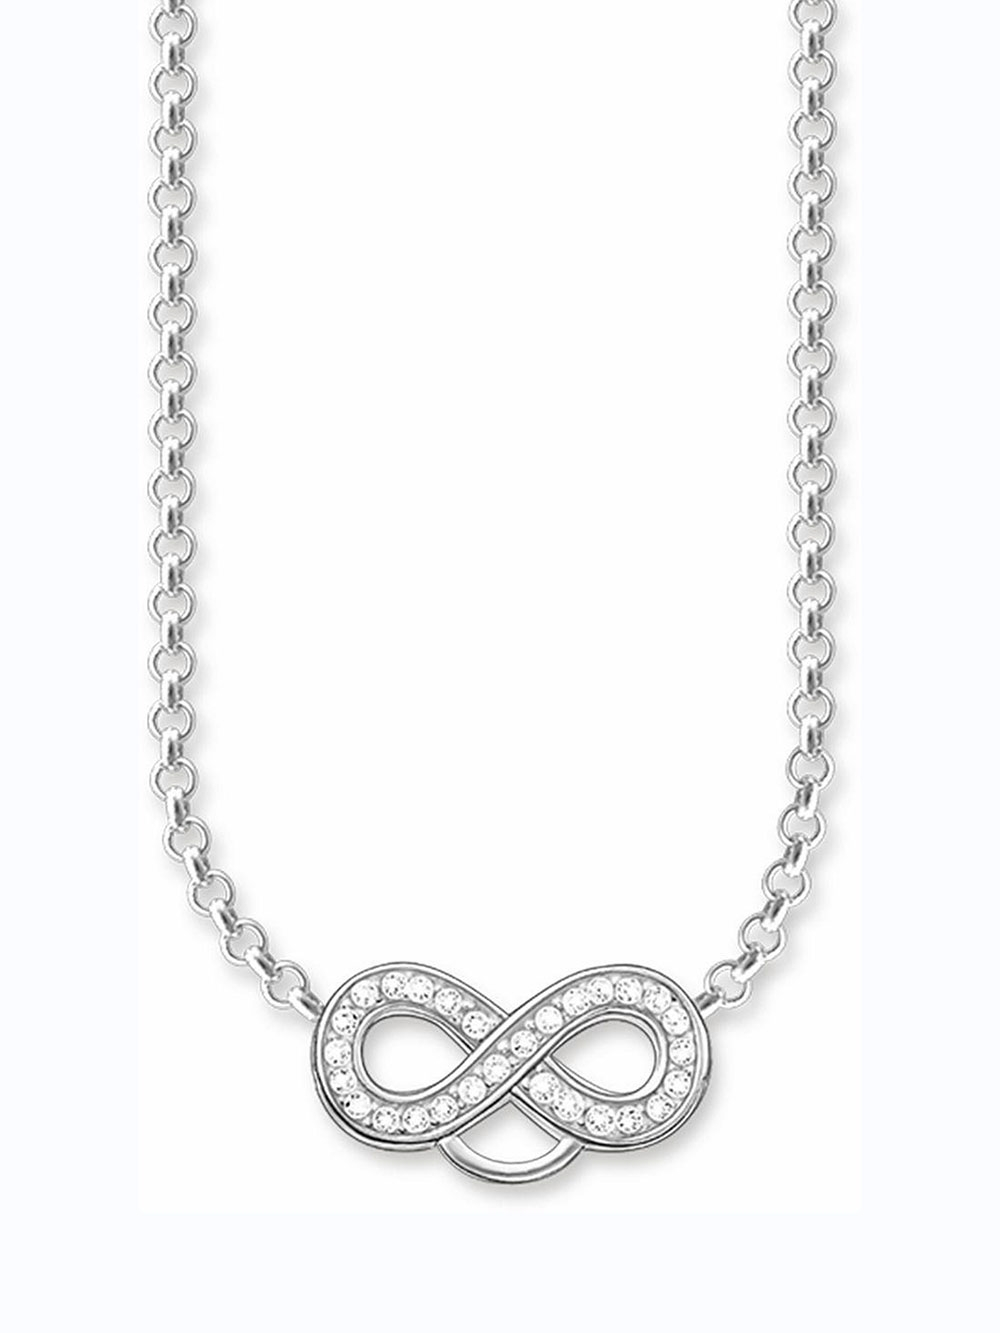 Thomas Sabo Halskette X0205-051-14 925er m. Anhänger Infinity 38-44cm